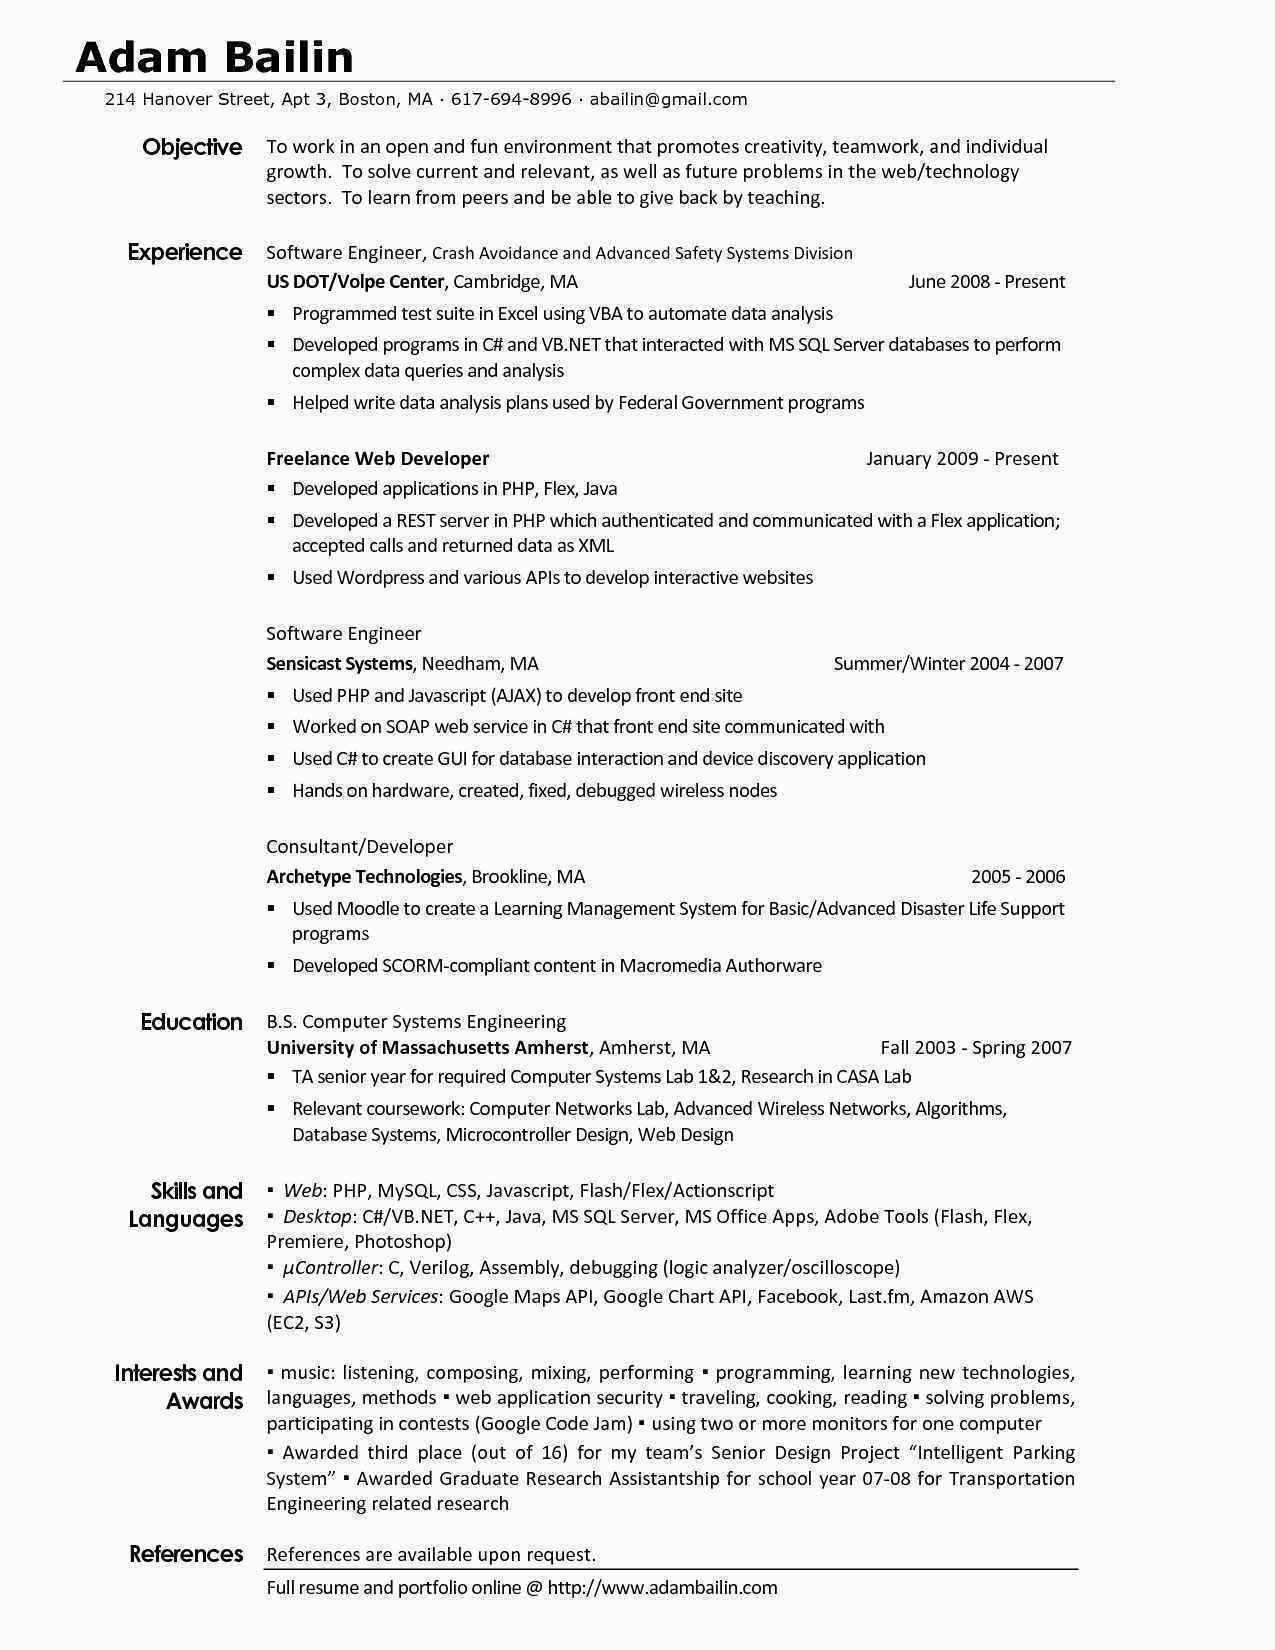 Experience Resume Format For Xml Developer Resume Examples